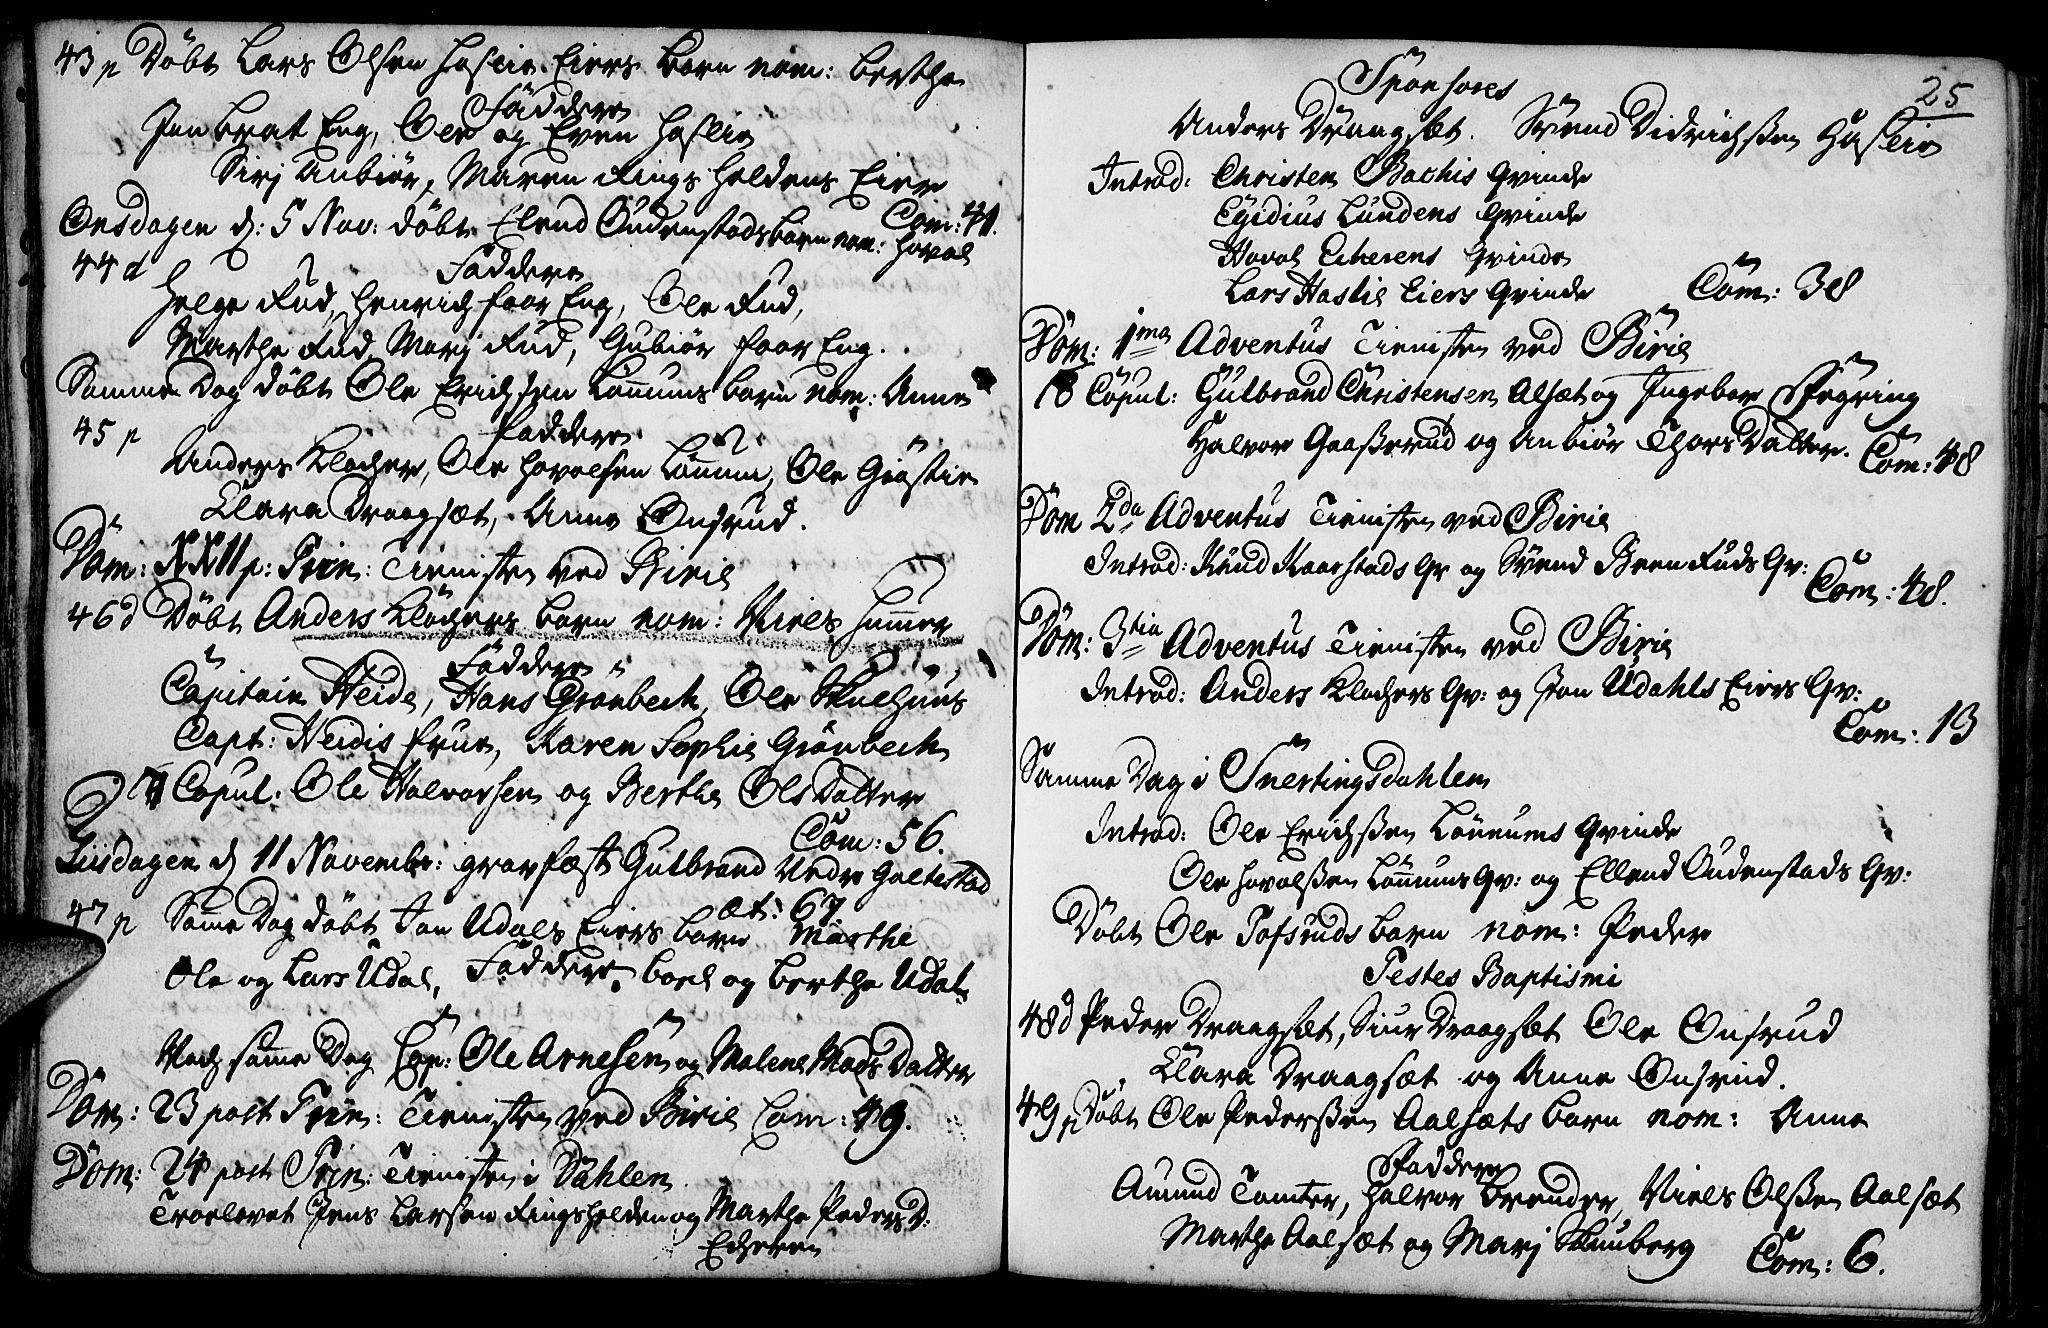 SAH, Biri prestekontor, Ministerialbok nr. 1, 1730-1754, s. 25